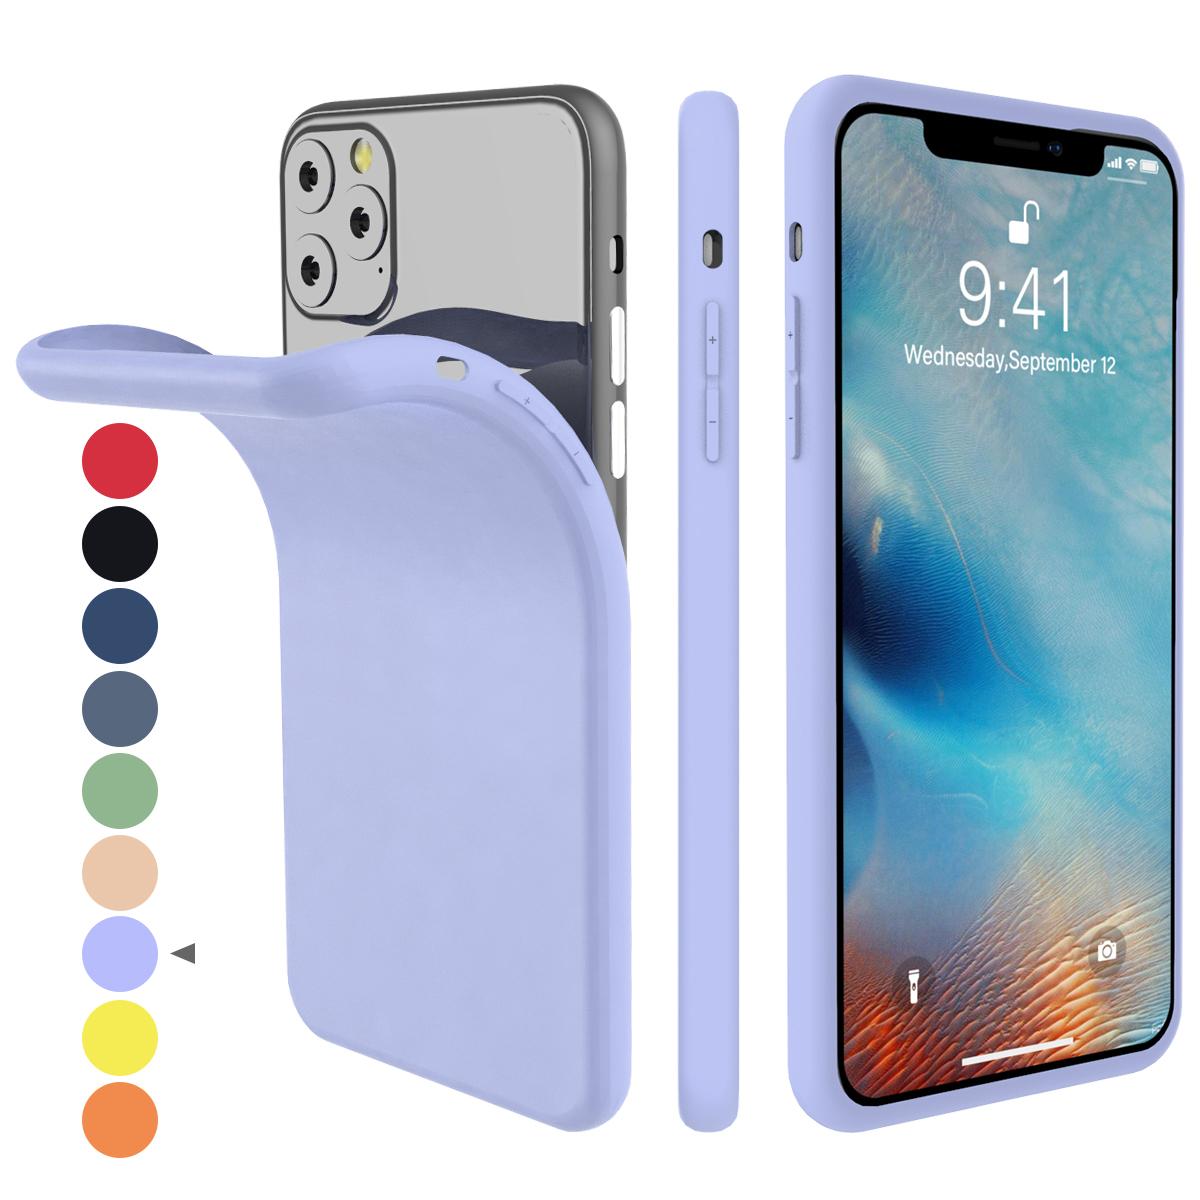 Torubia Silicone Case for iPhone 11/11 Pro/11 Pro Max 117